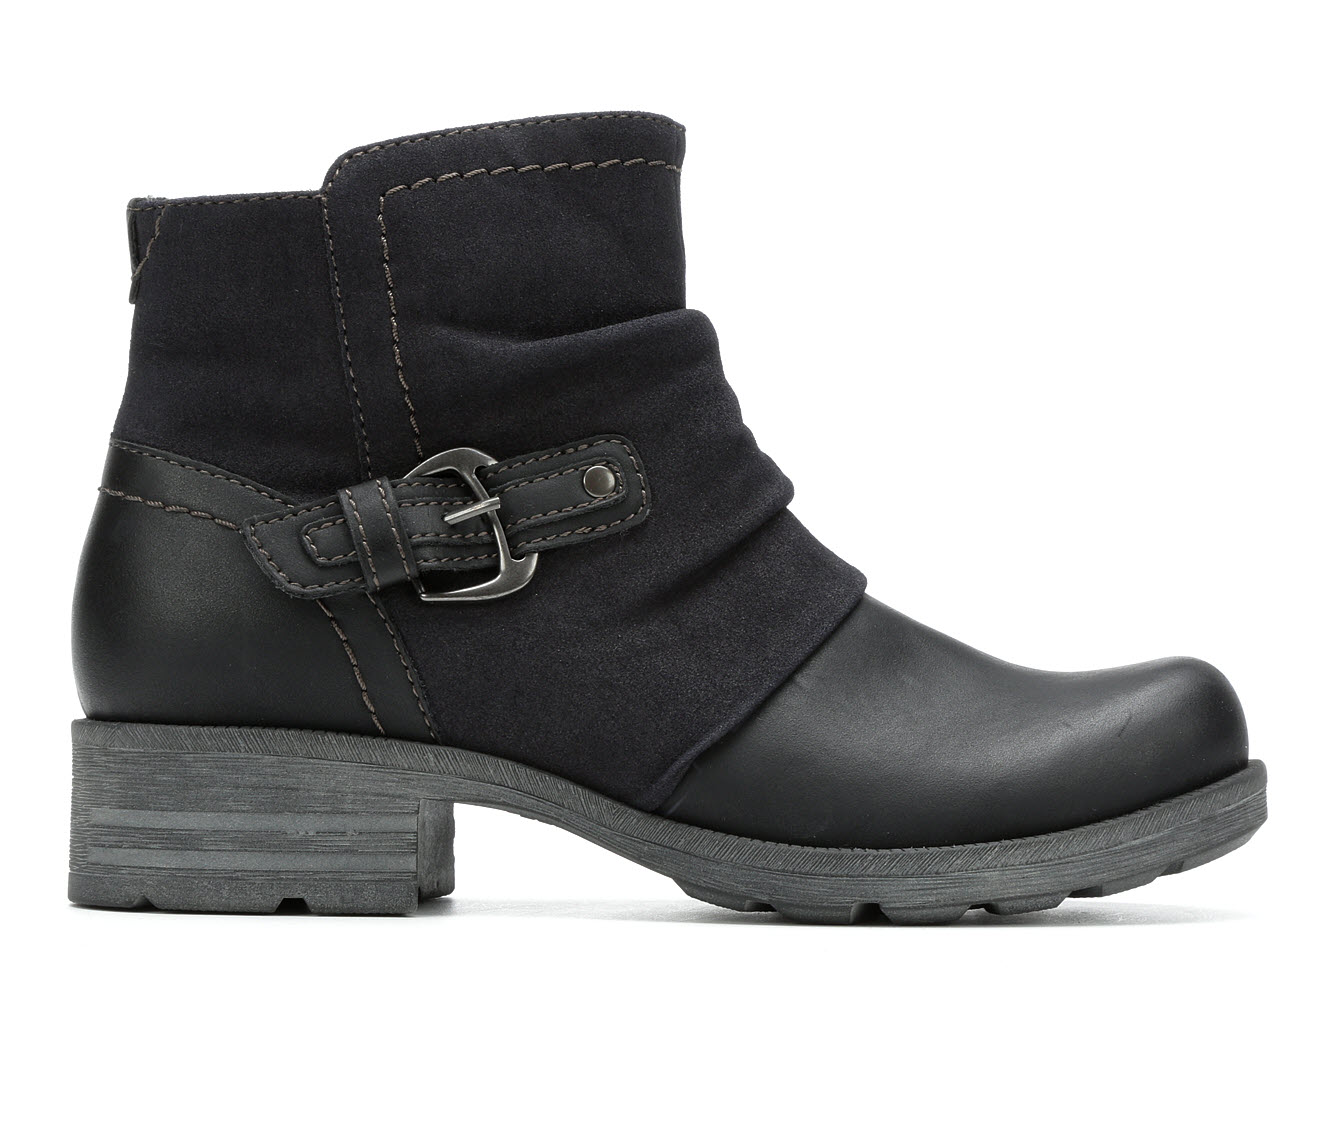 Earth Origins Randi Rona Women's Boots (Black - Faux Leather)